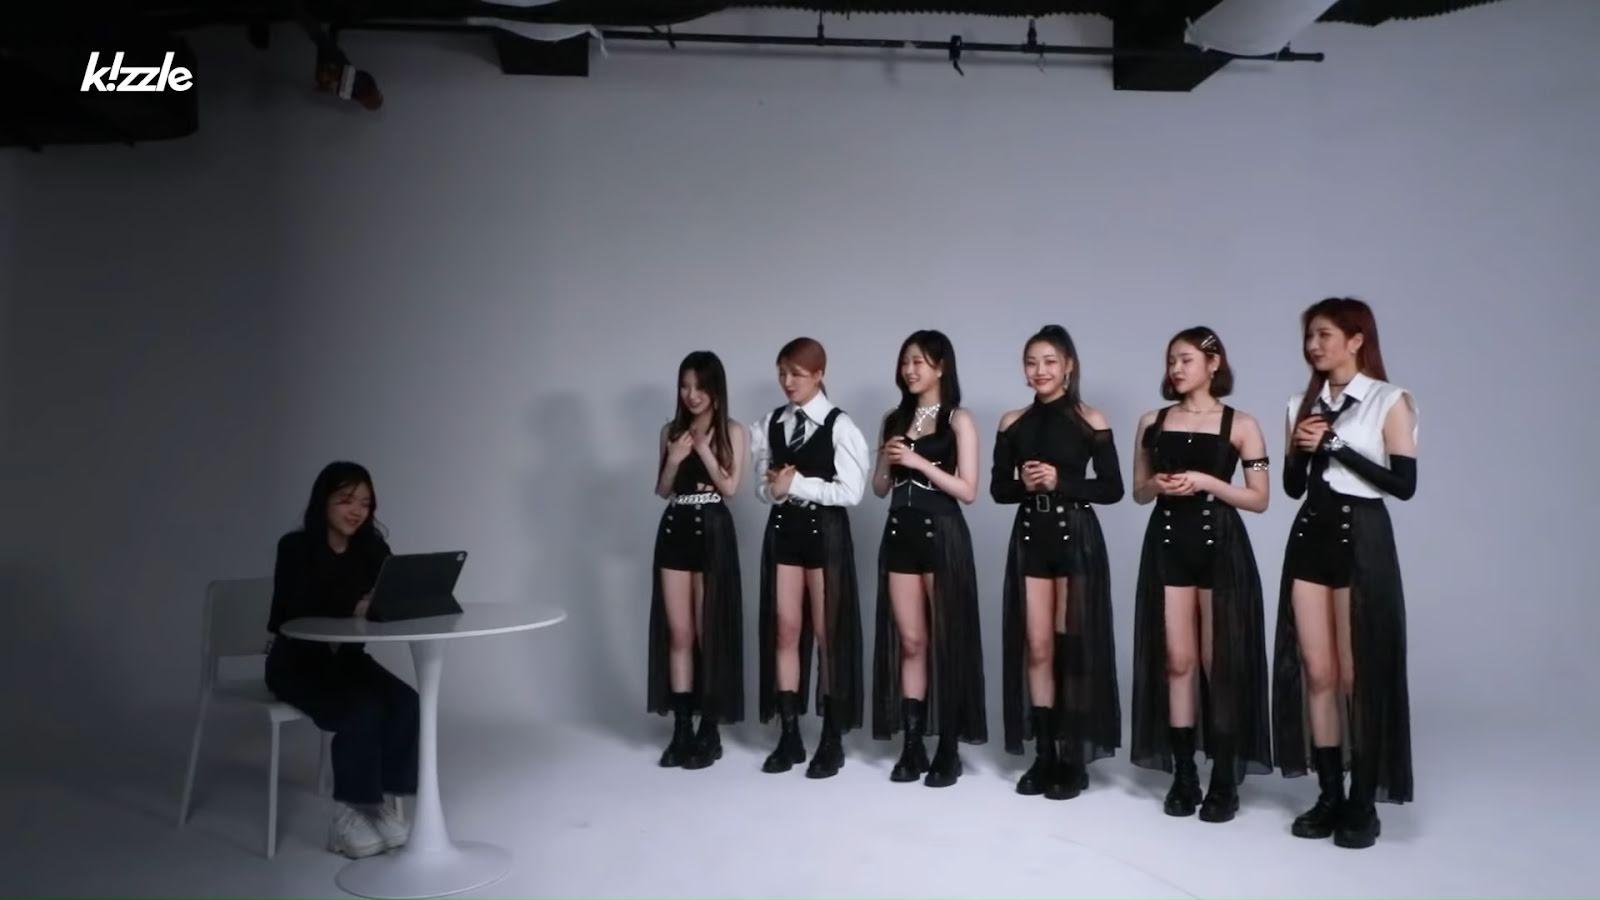 kids said _bixxh_ to the kpop girl group _ Studio Kizzle 0-5 screenshot